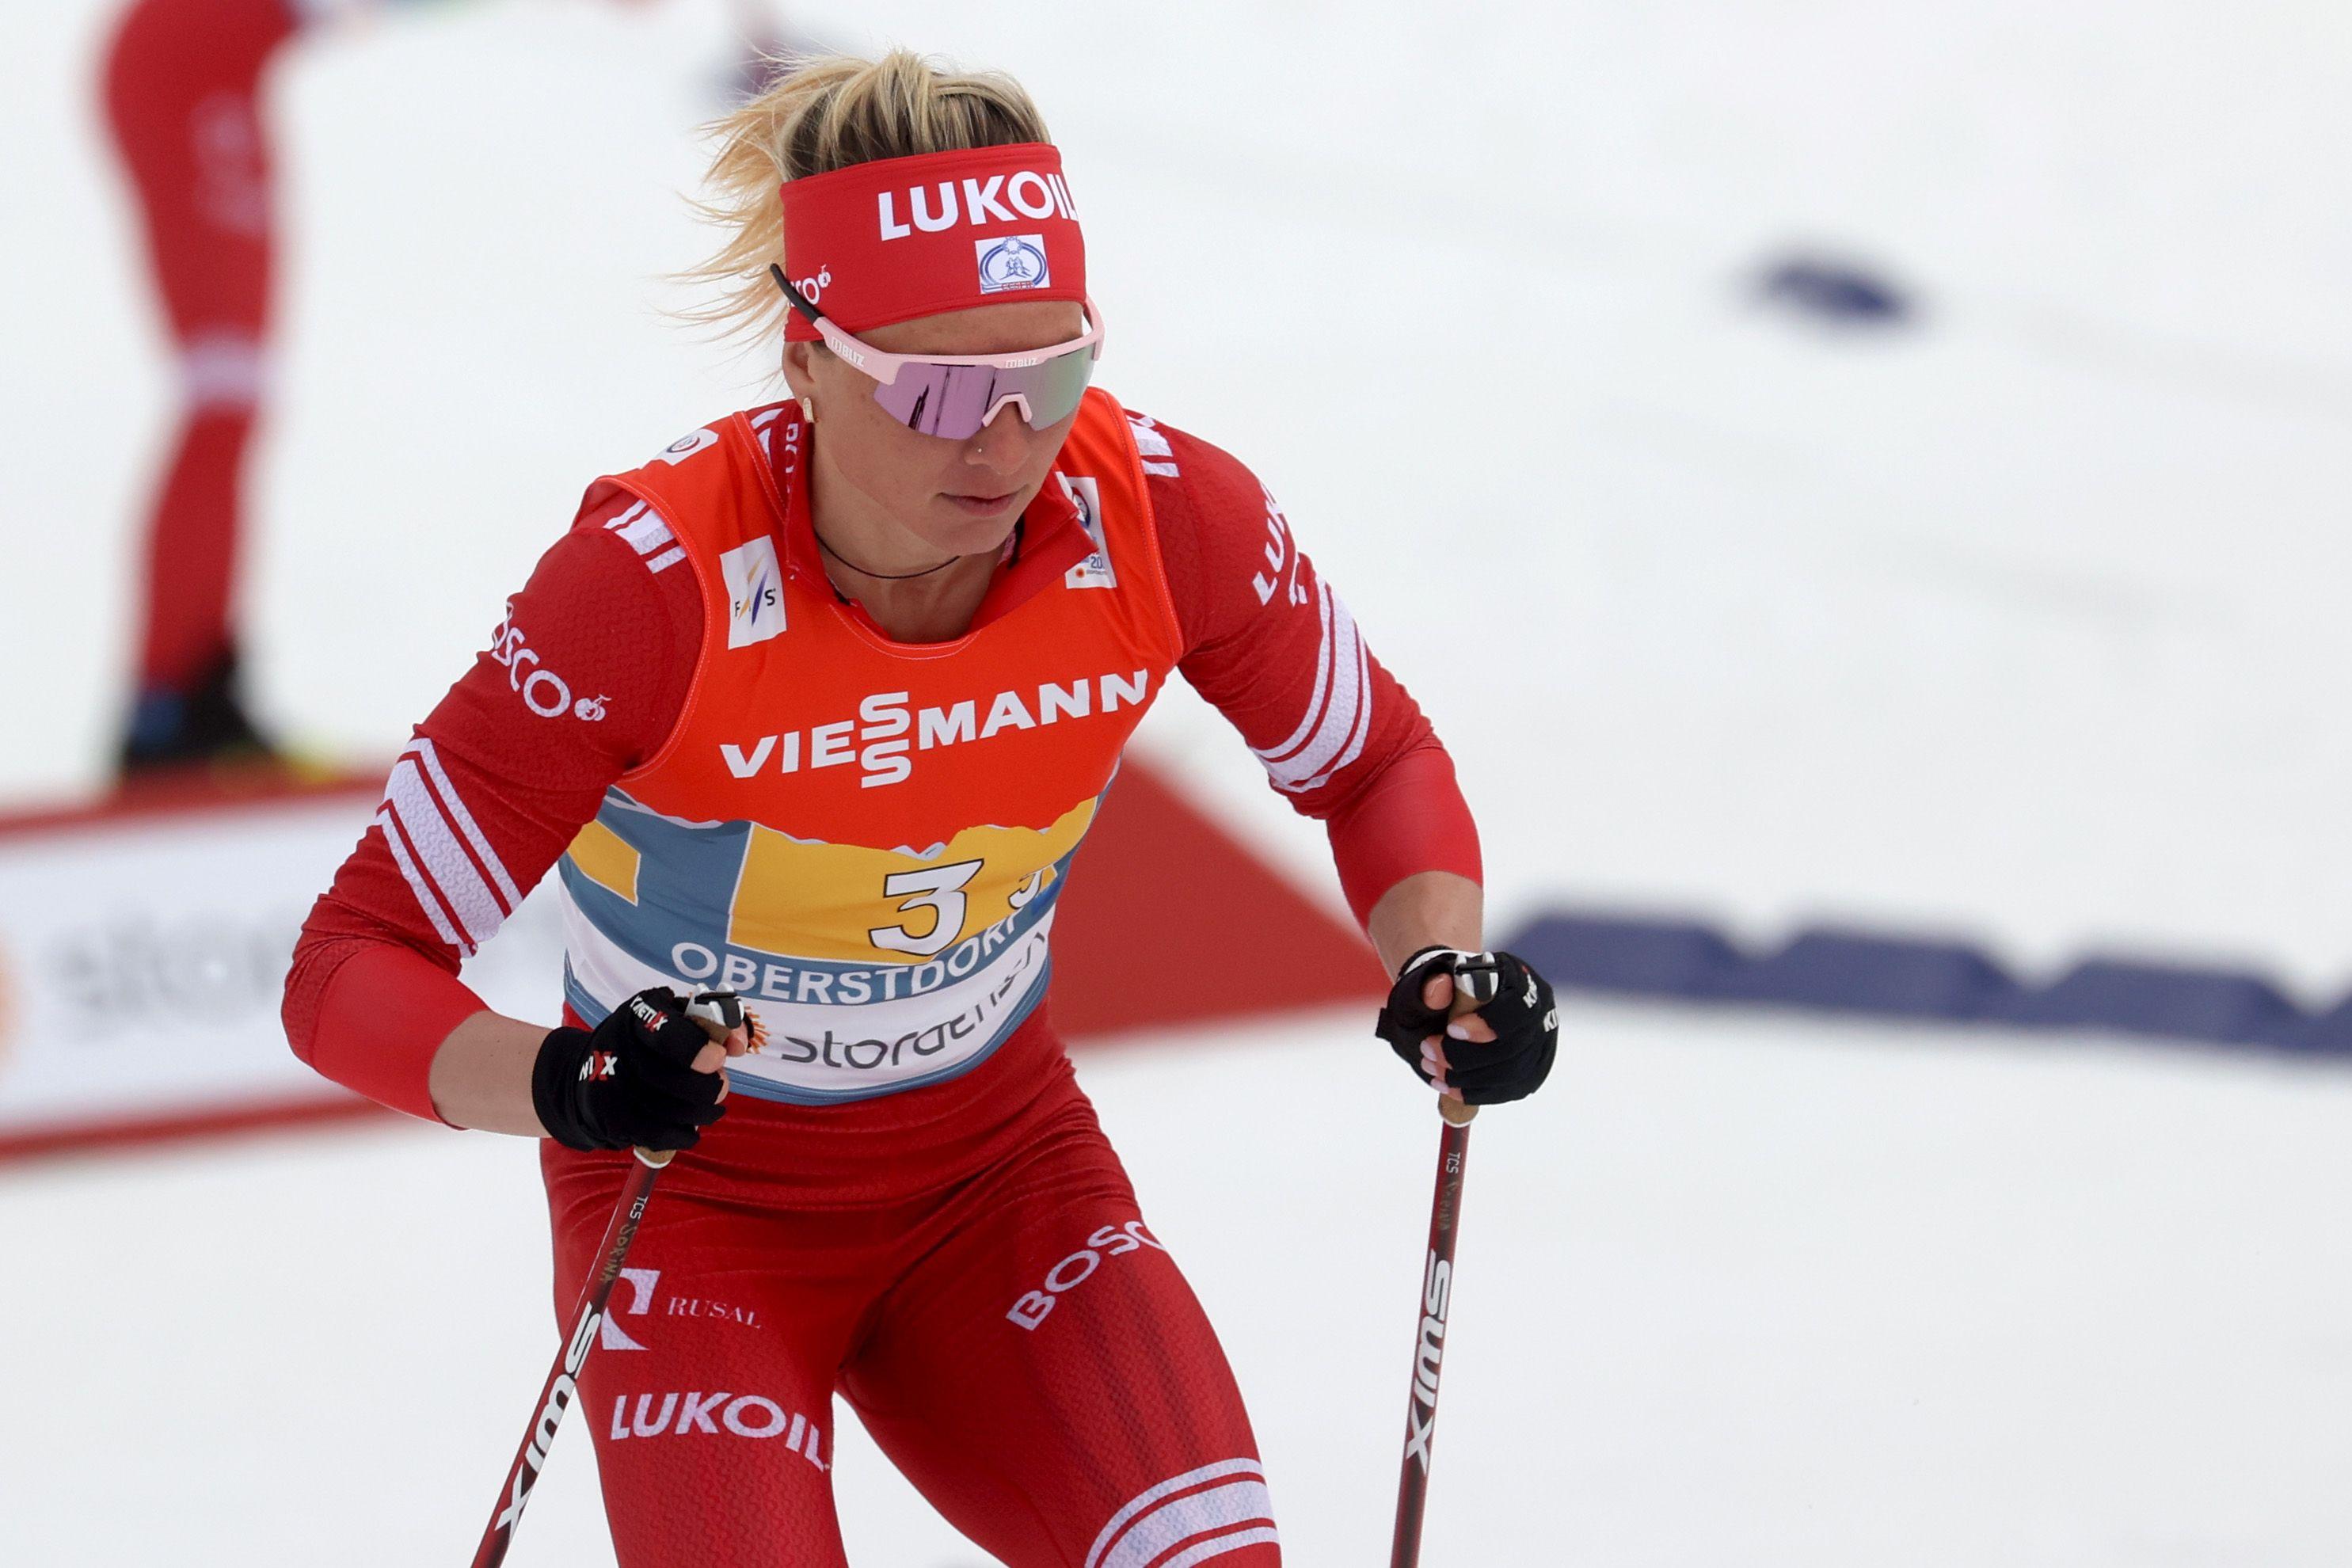 Сорина выиграла скиатлон на чемпионате России